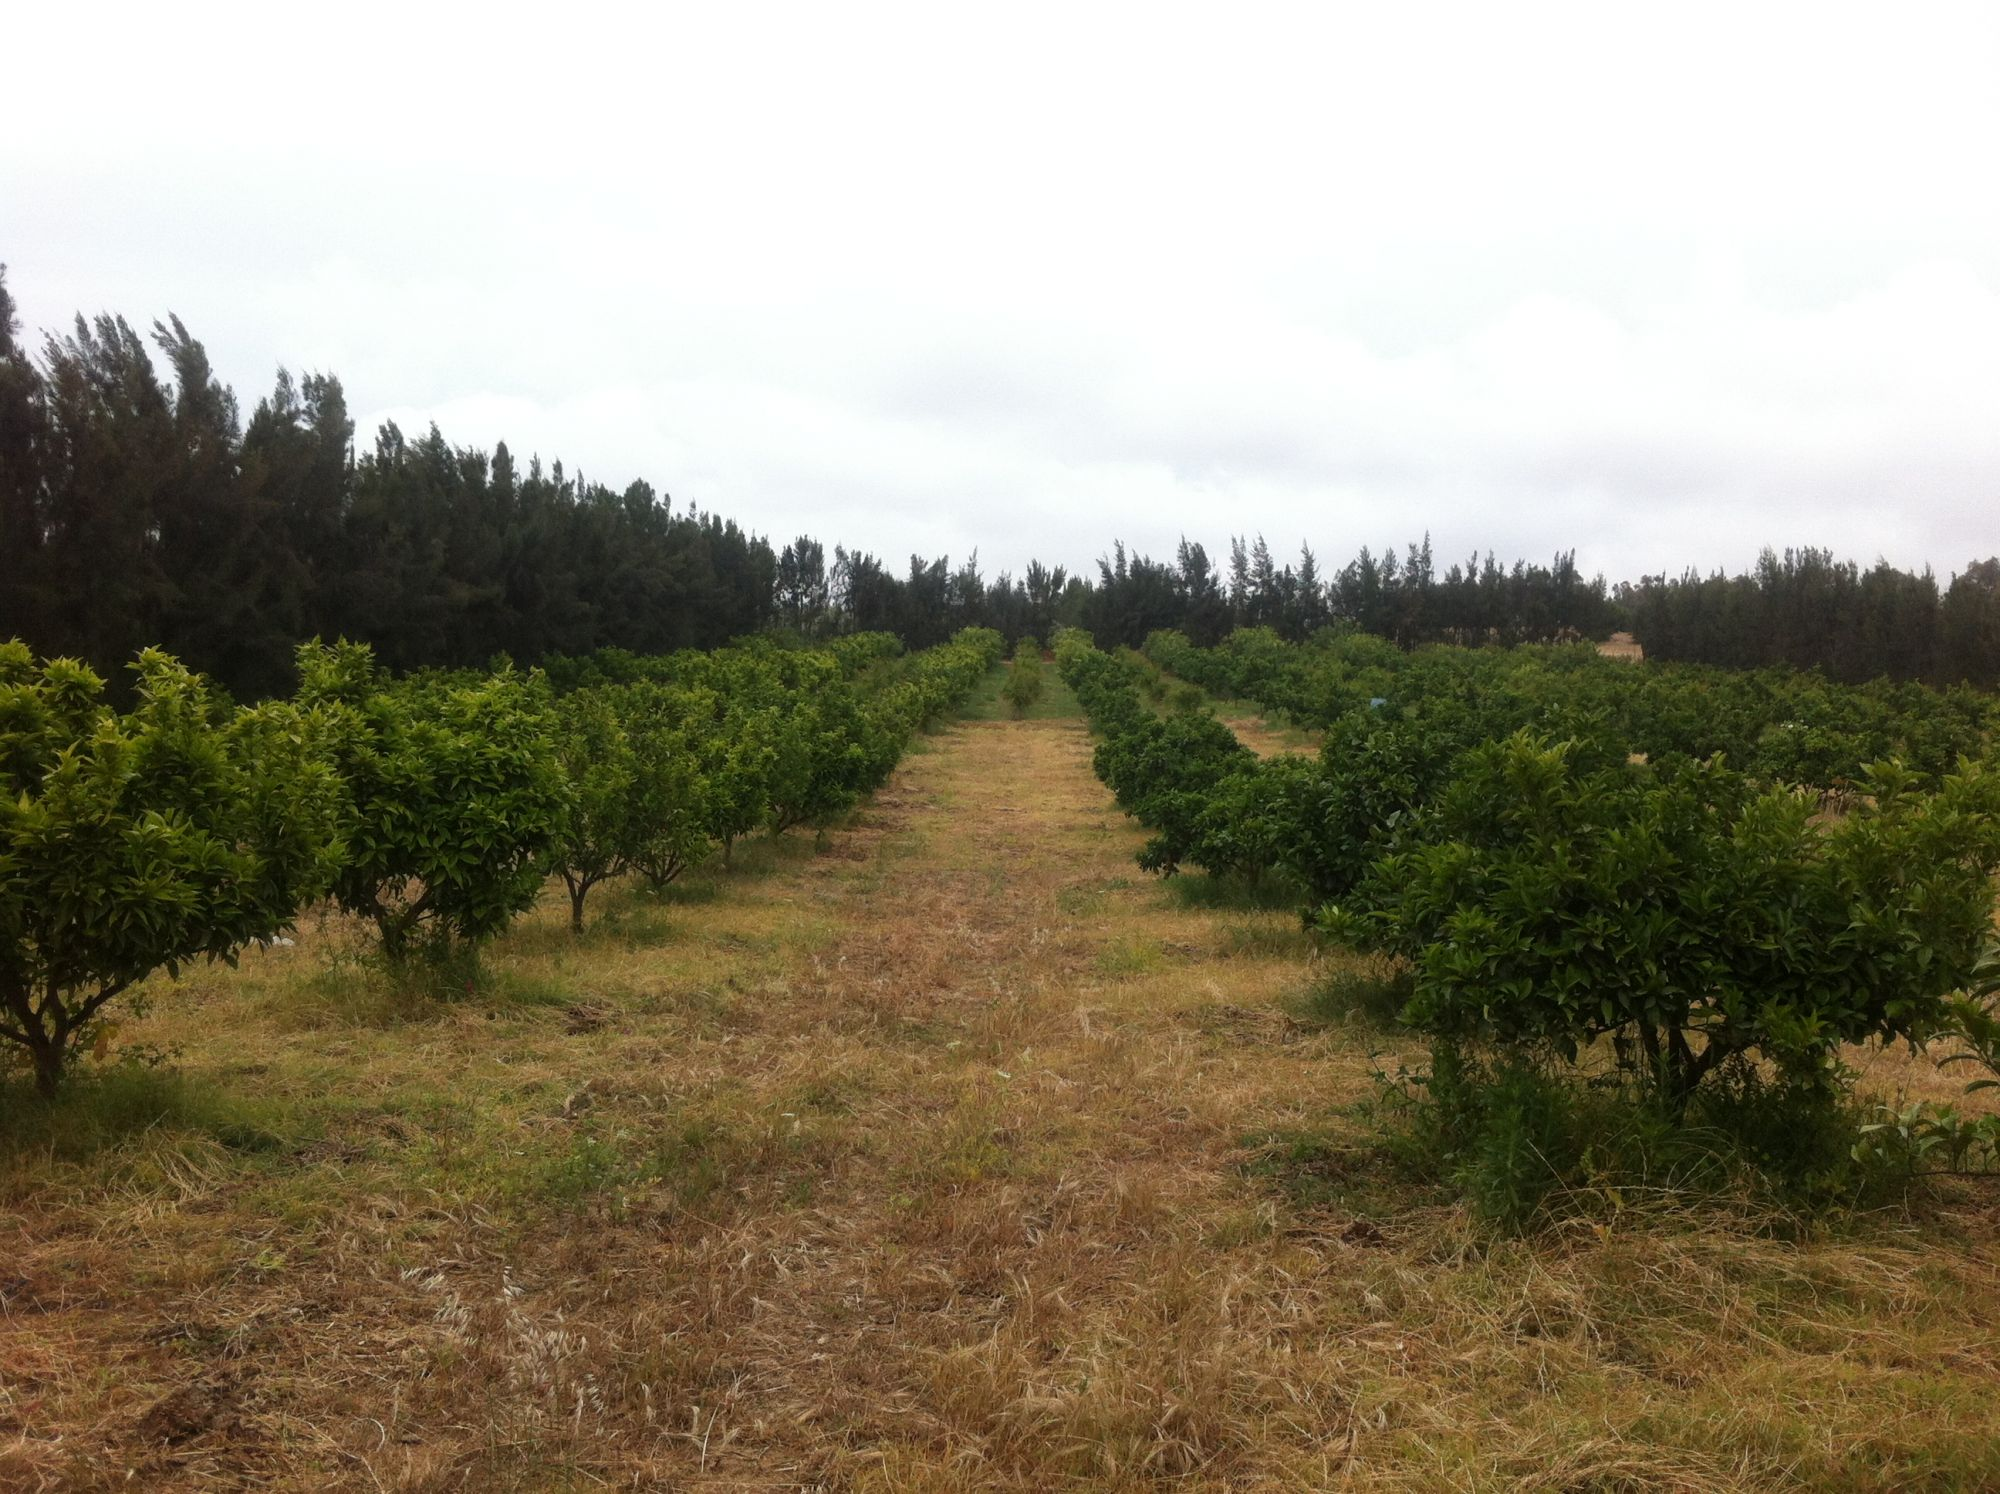 Terrain agricole cultiv hammamet vente terrain hammamet for Construction terrain agricole